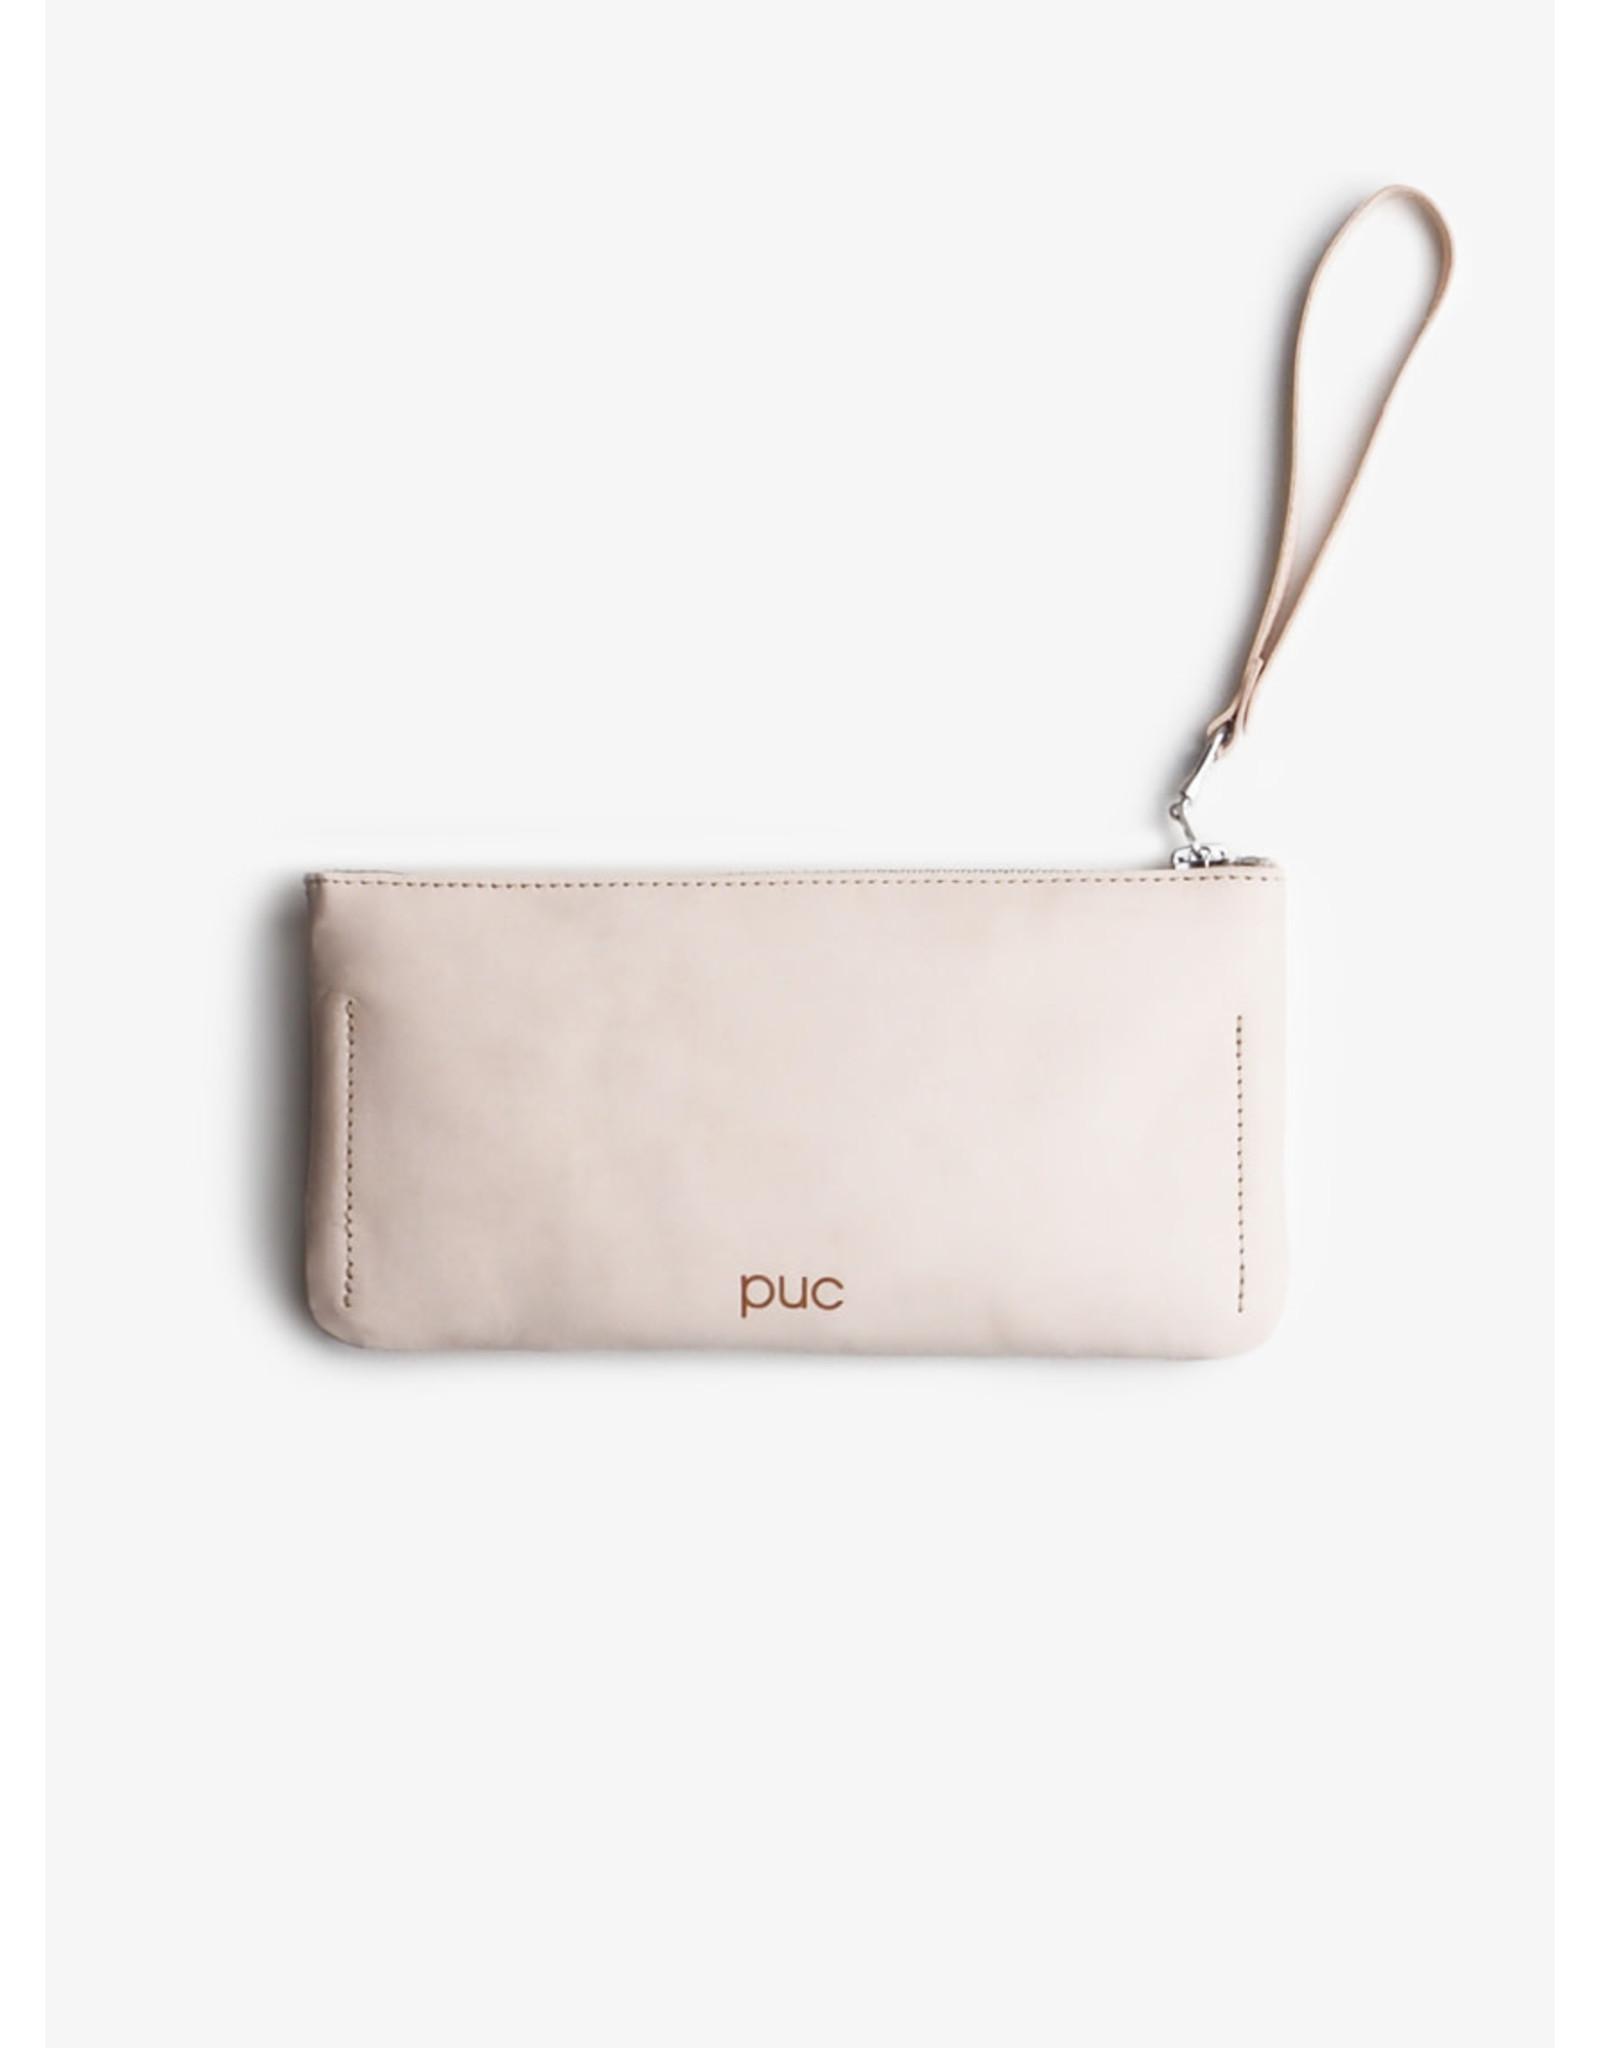 Puc Journey Wallet | Nude | 21 x 10,5 cm